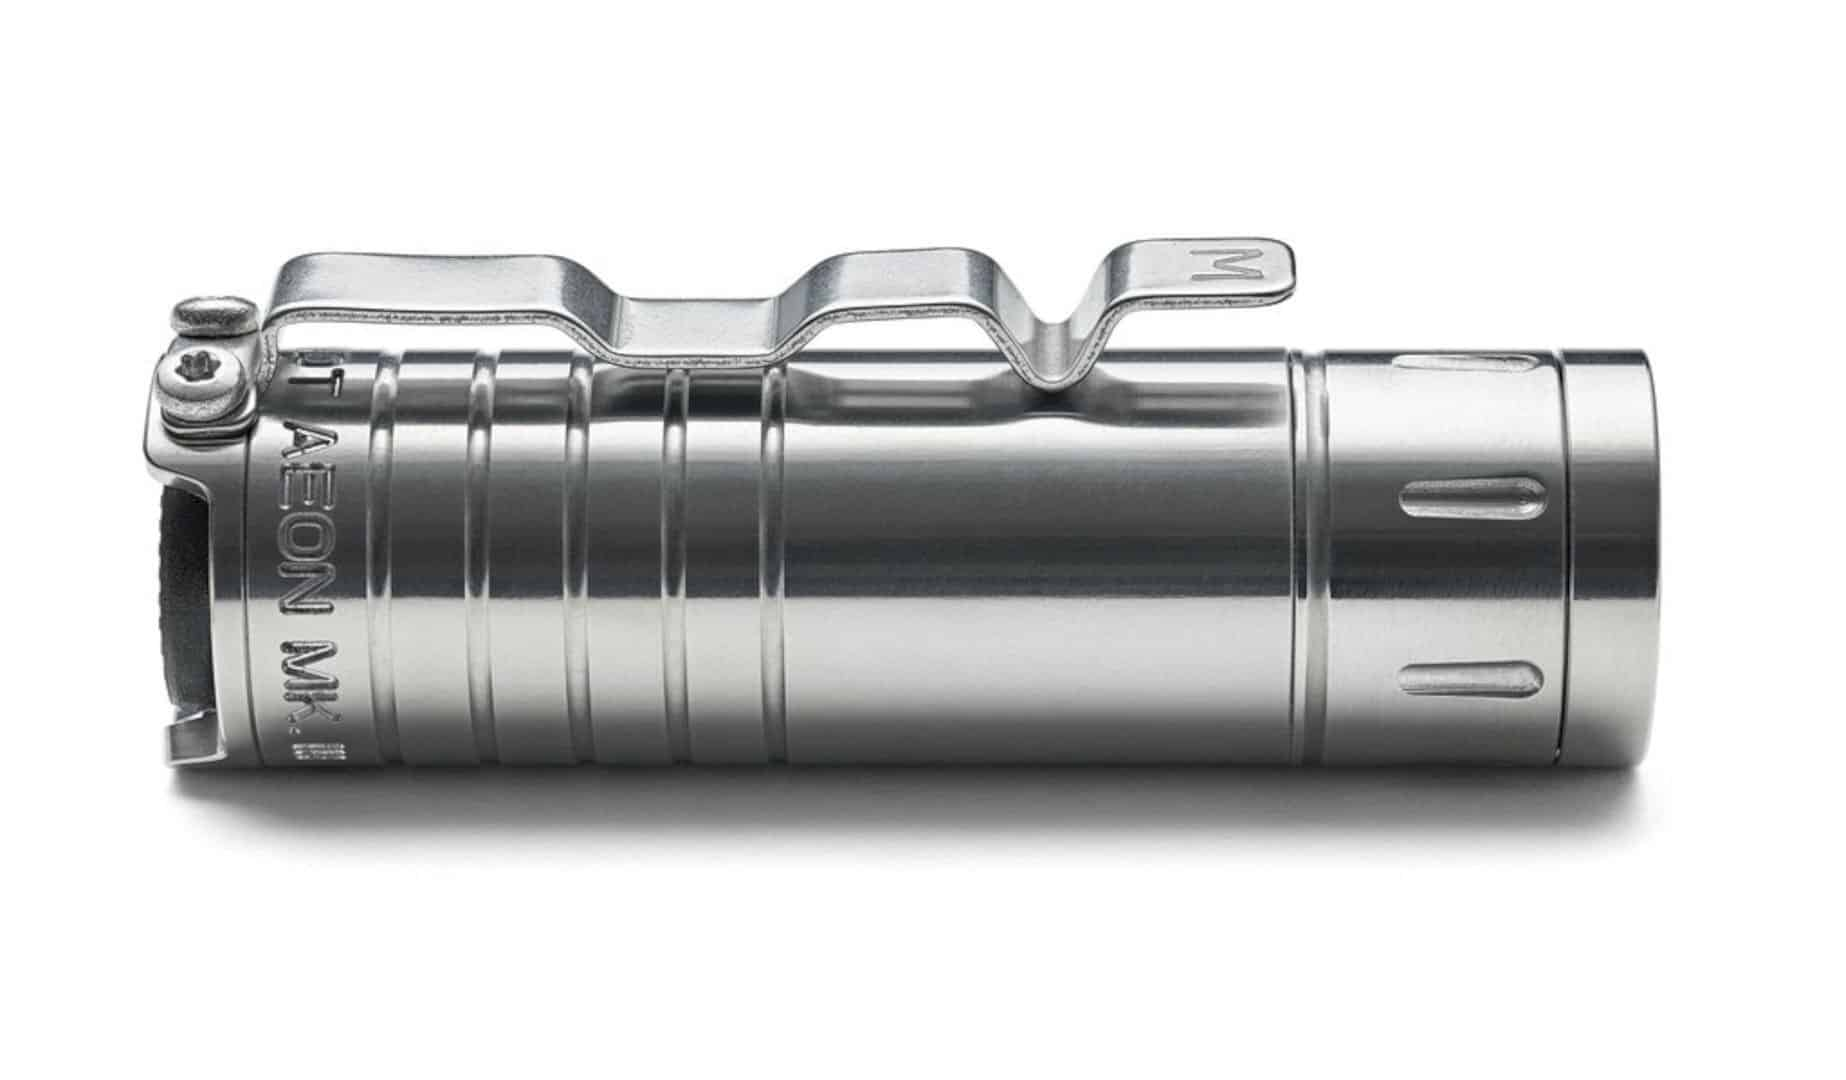 Aeon Mk Iii Electric Torch Titanium Series 2 5